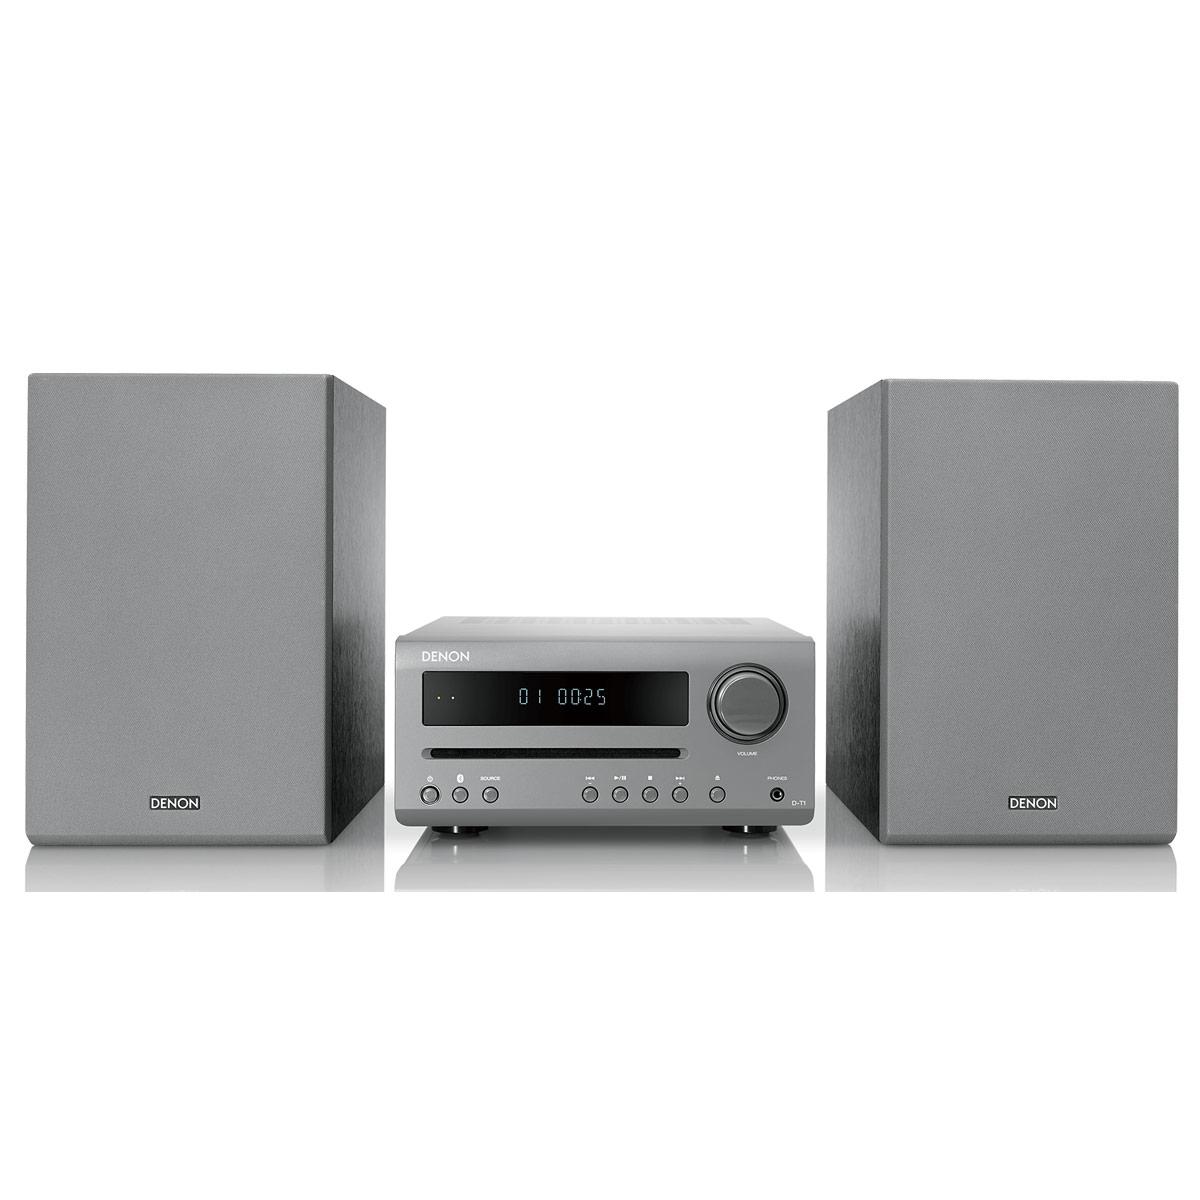 Chaîne Hifi Denon D-T1 Gris Mini-chaîne 2 x 15 Watts avec lecteur CD/CD-R/CD-RW, tuner FM et Bluetooth